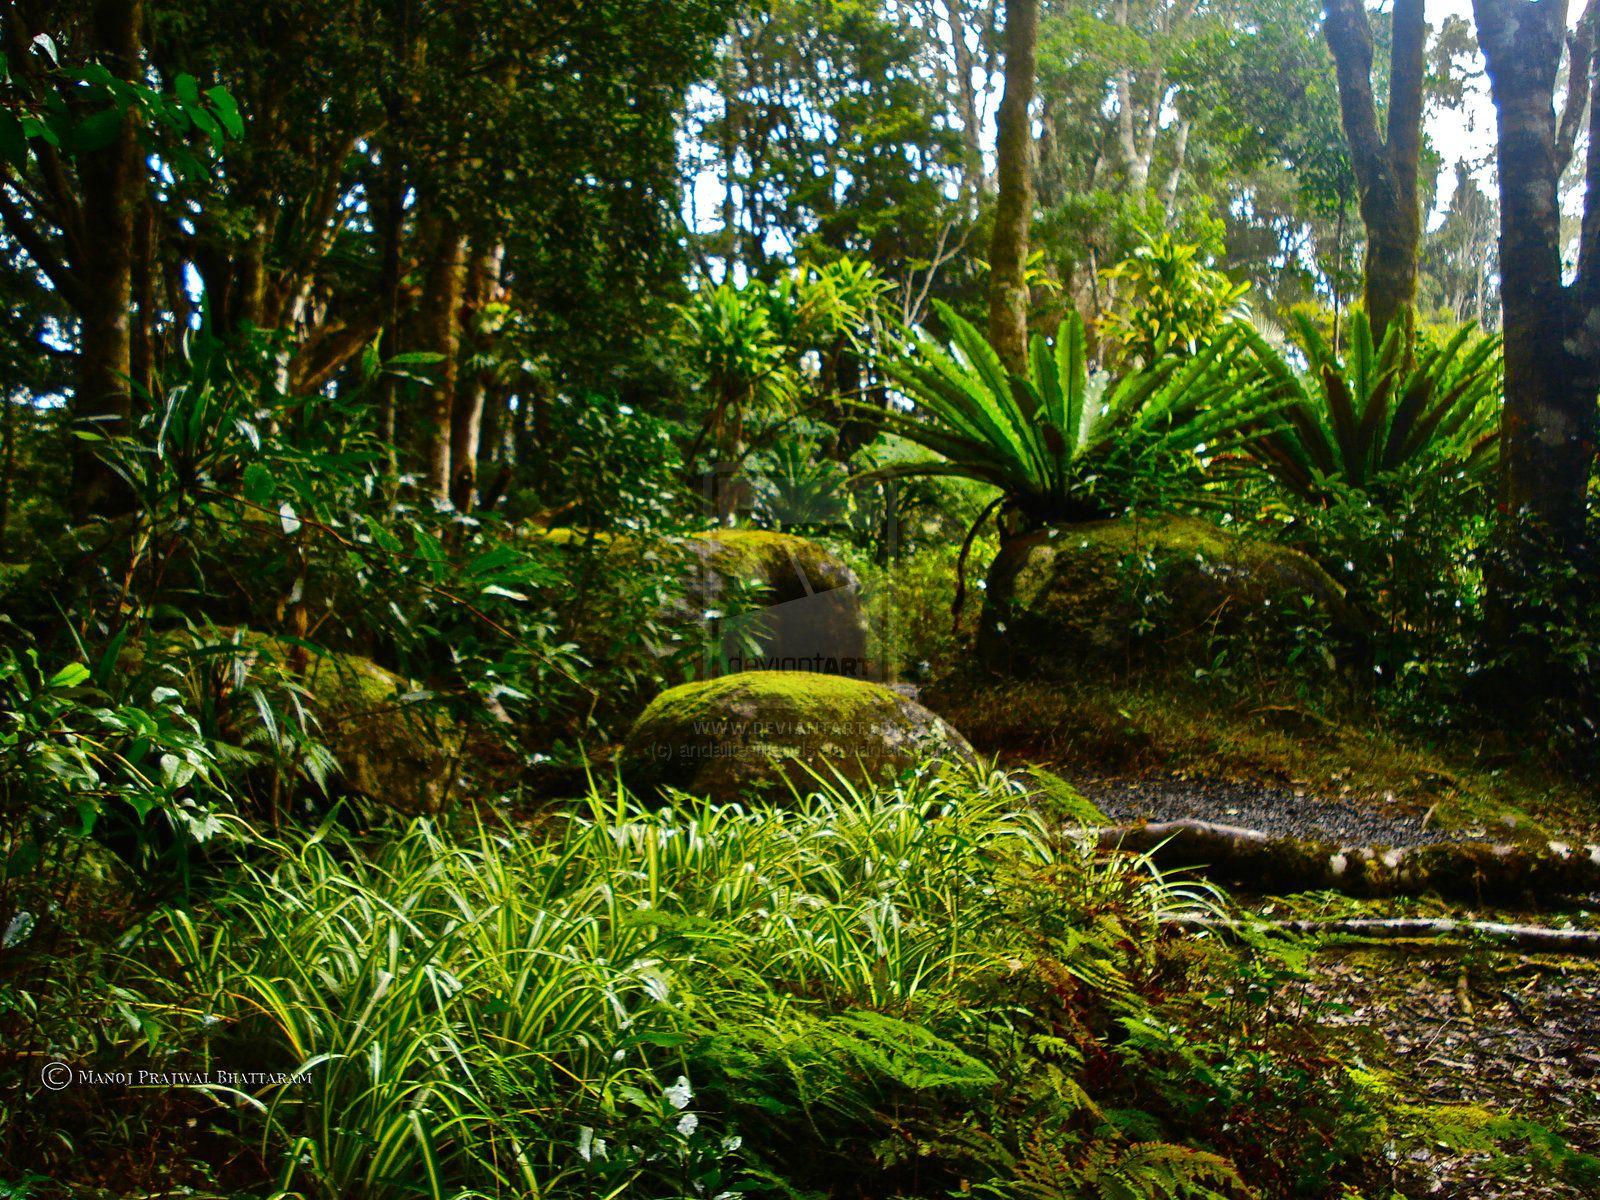 Rainforest Forest Floor Plants